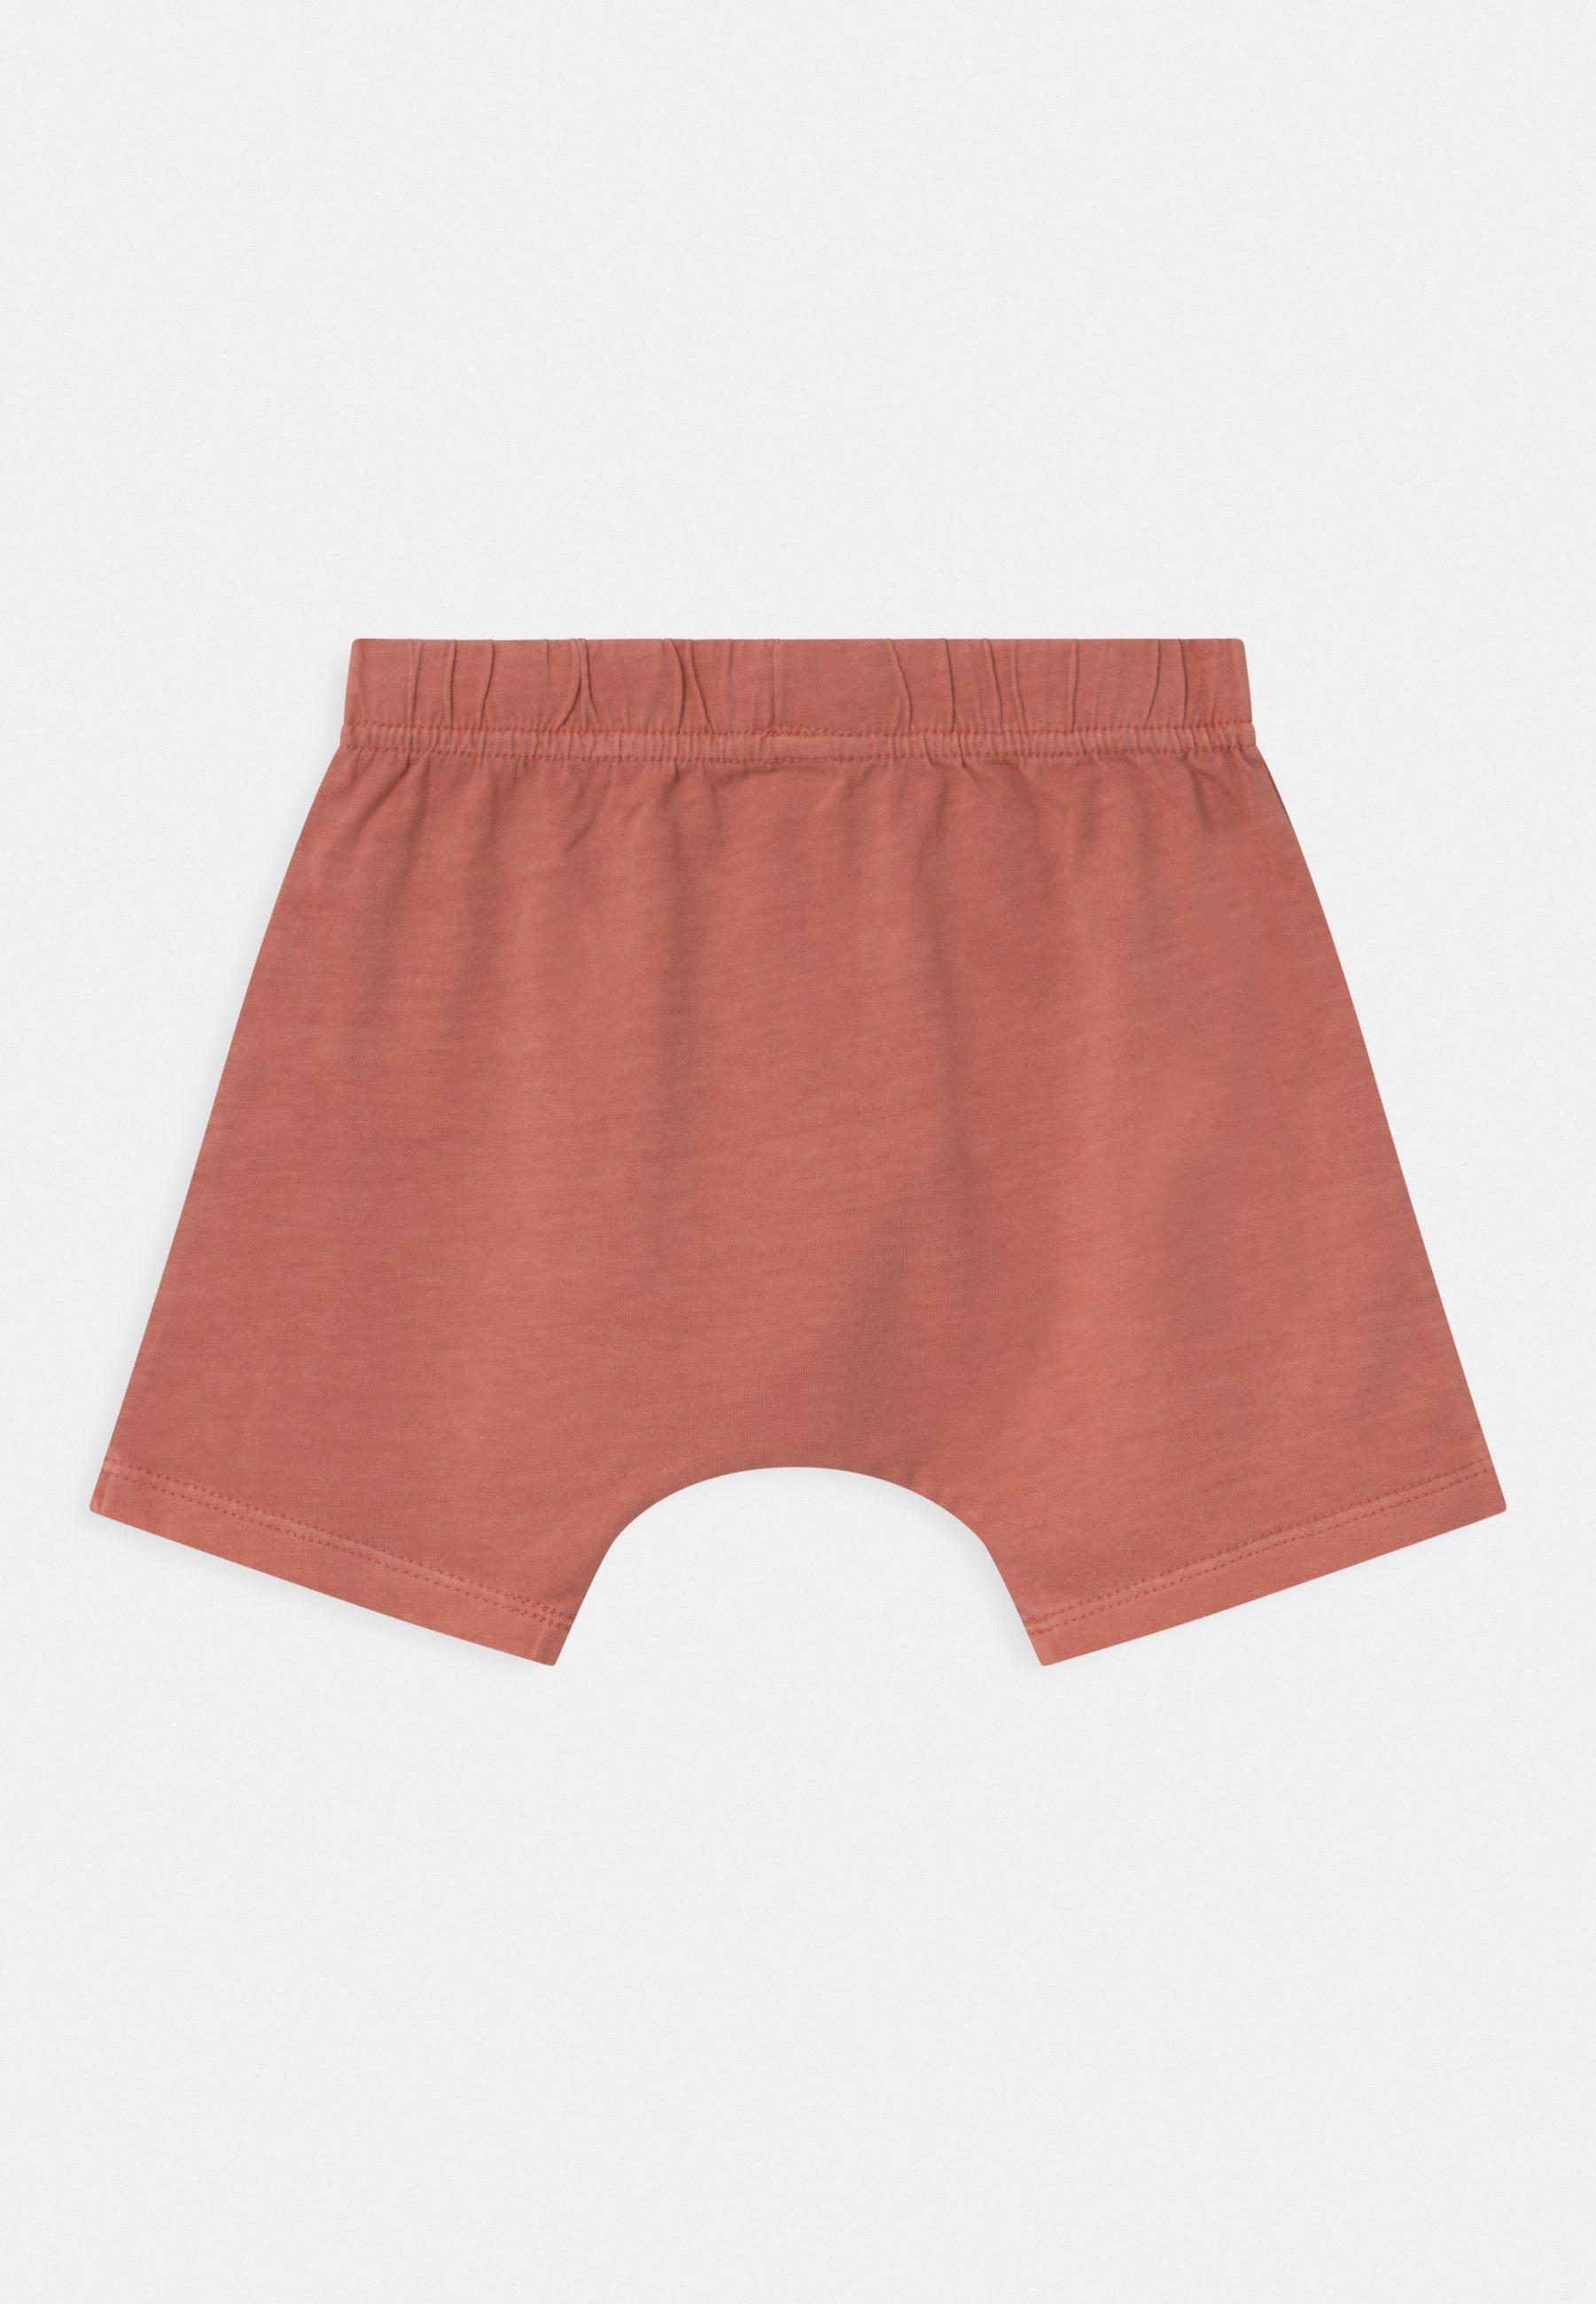 Kids MIKKO 3 PACK UNISEX - Shorts